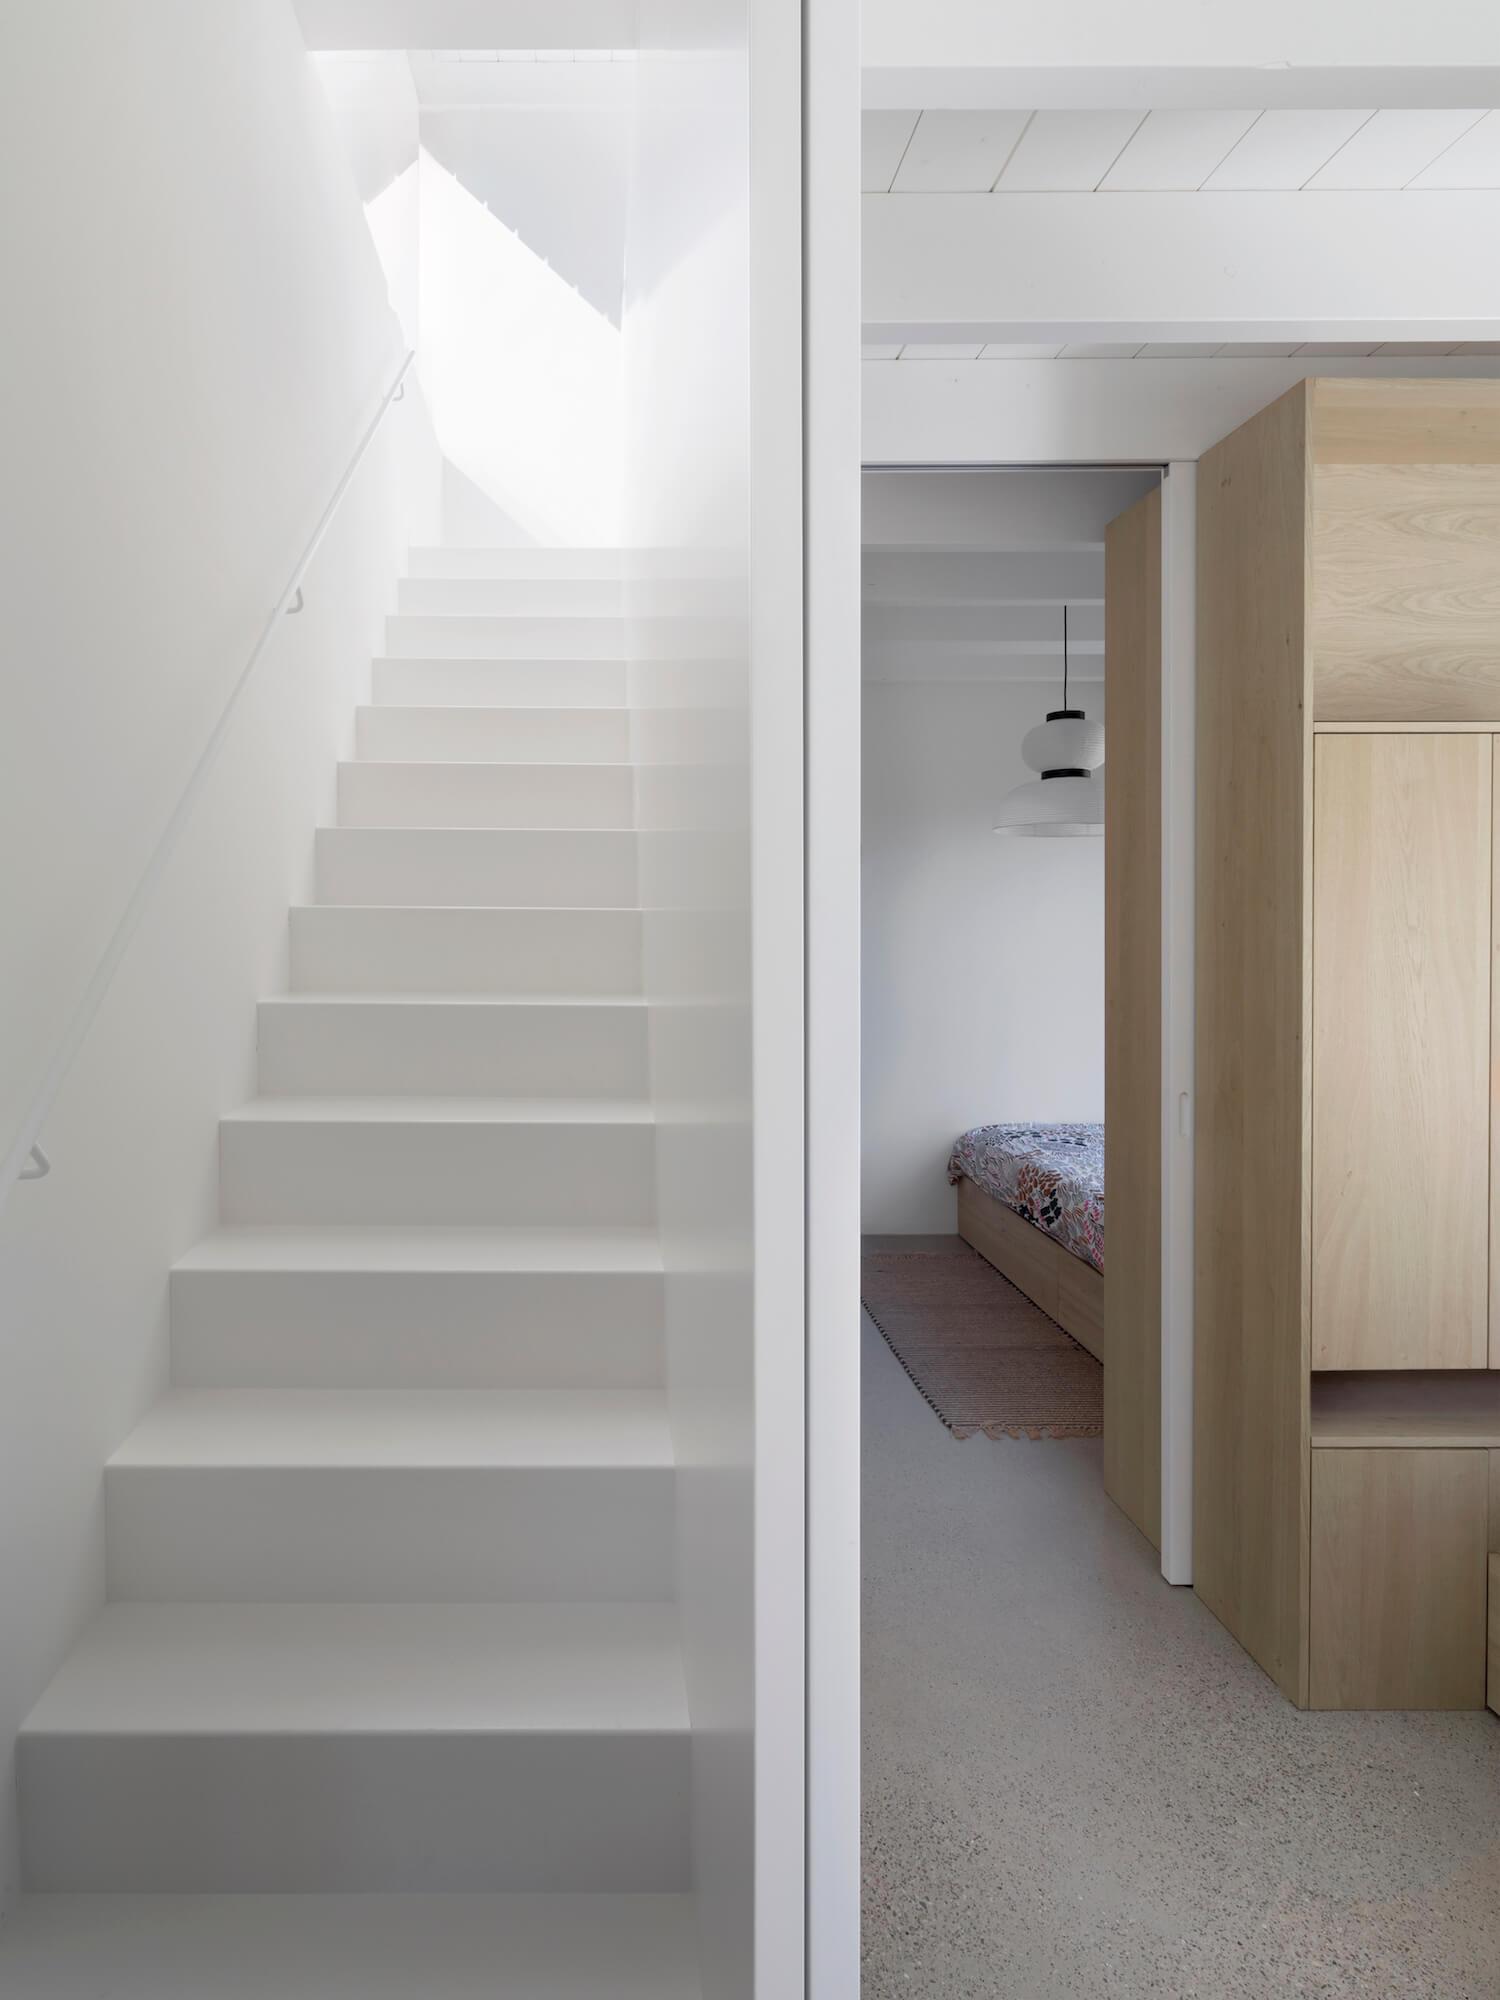 est living tiny holiday home i29 architects 16